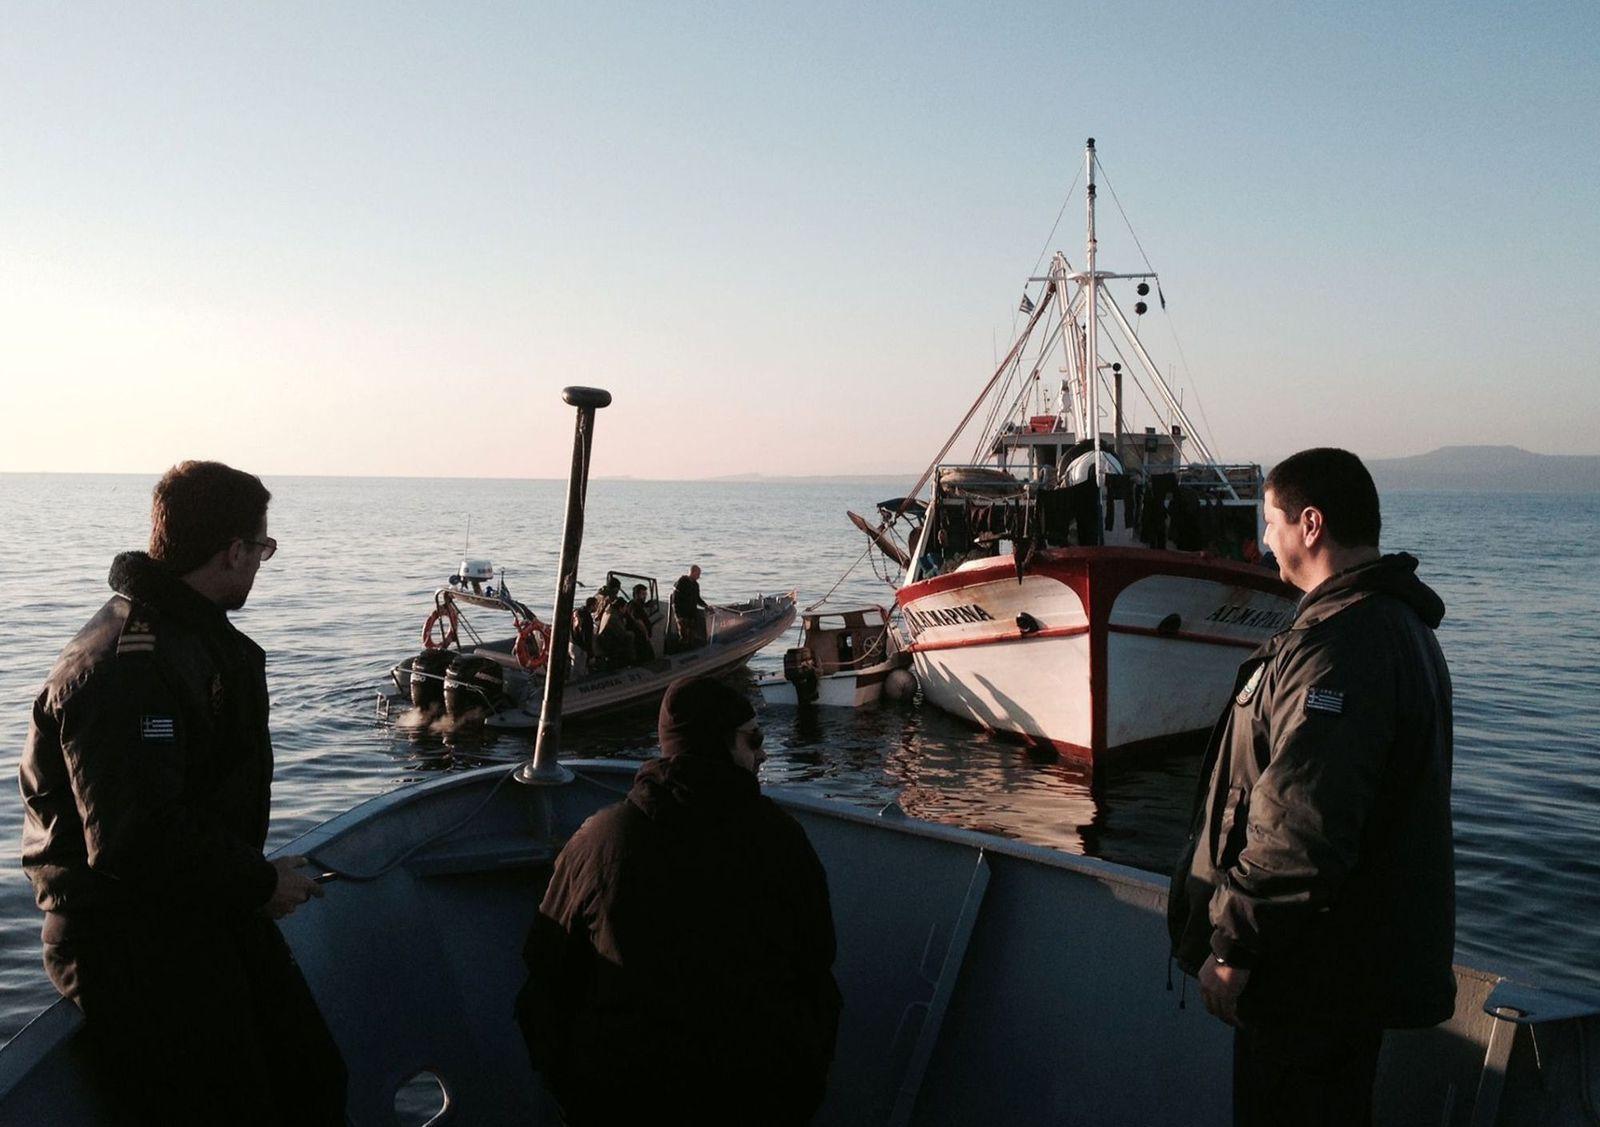 Greece Migrants Killed